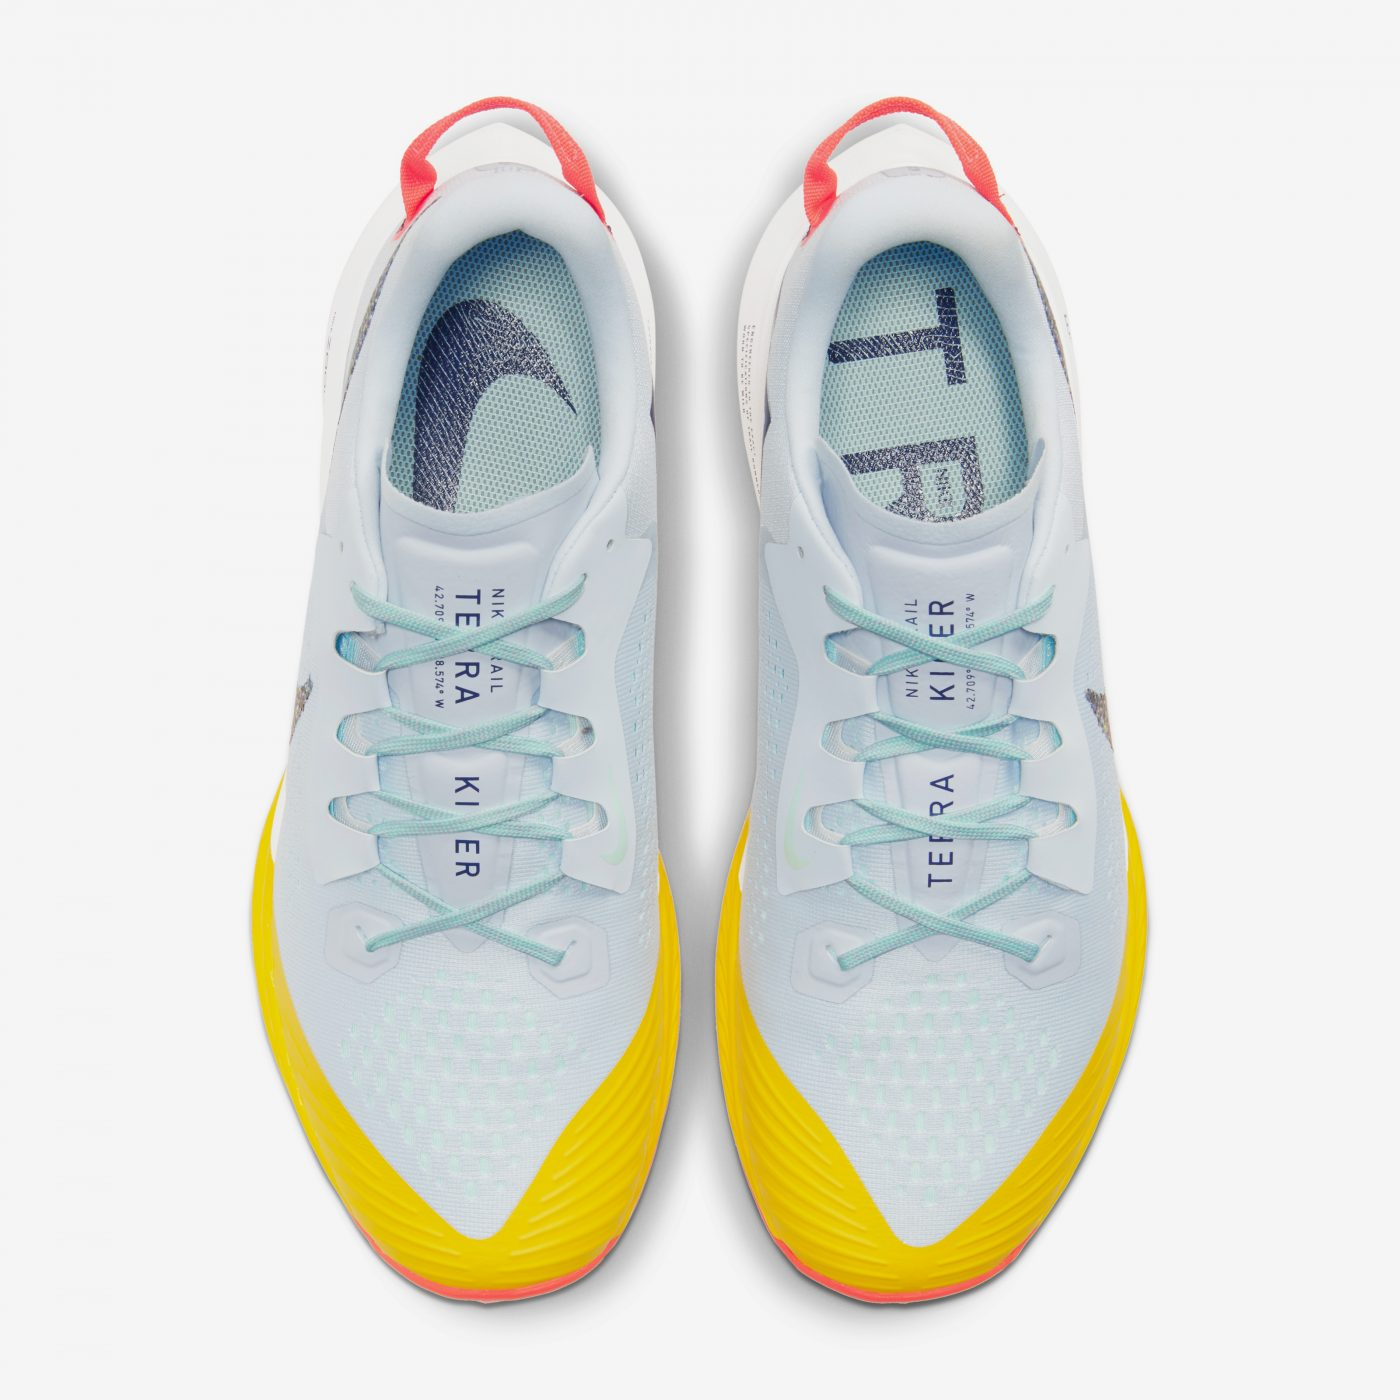 nike-chaussures-trail-Air-Zoom-Terra-Kiger-6-6-runpack-7